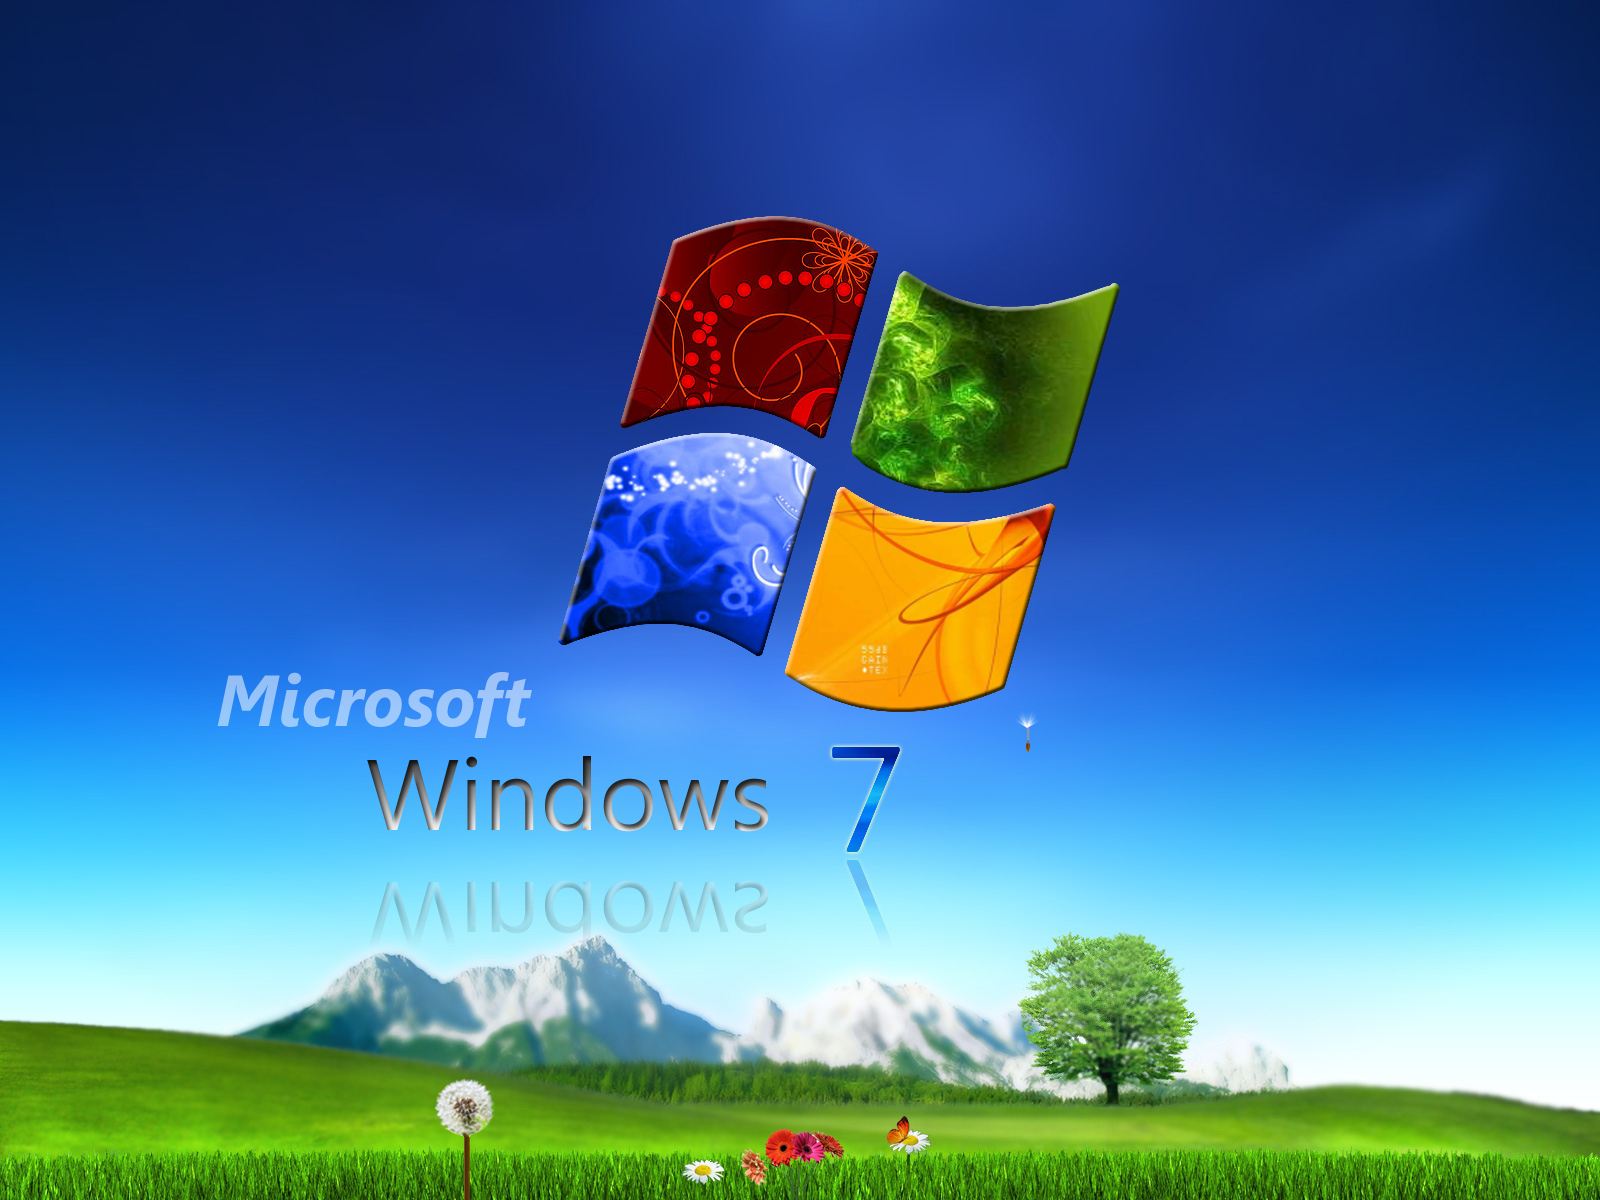 50 Free Windows 7 Wallpapers On Wallpapersafari